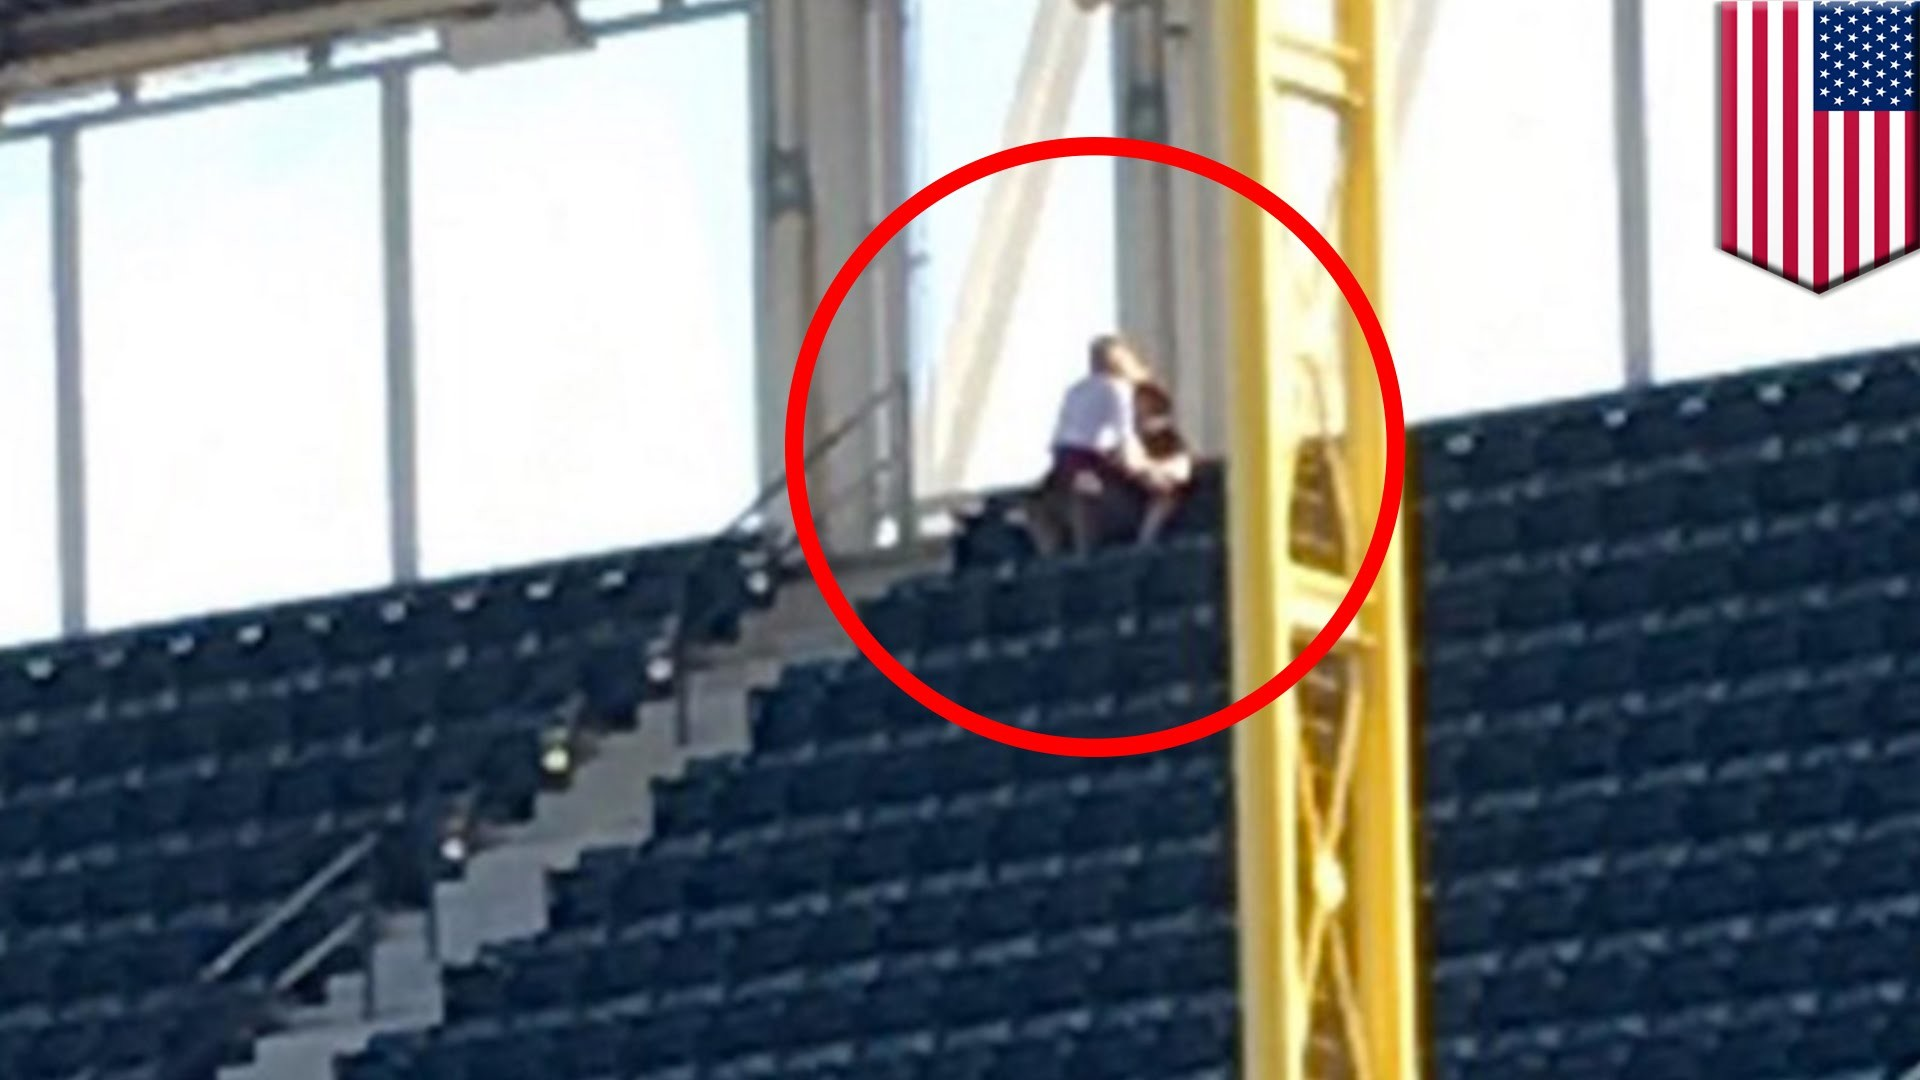 Couple having sex at baseball game